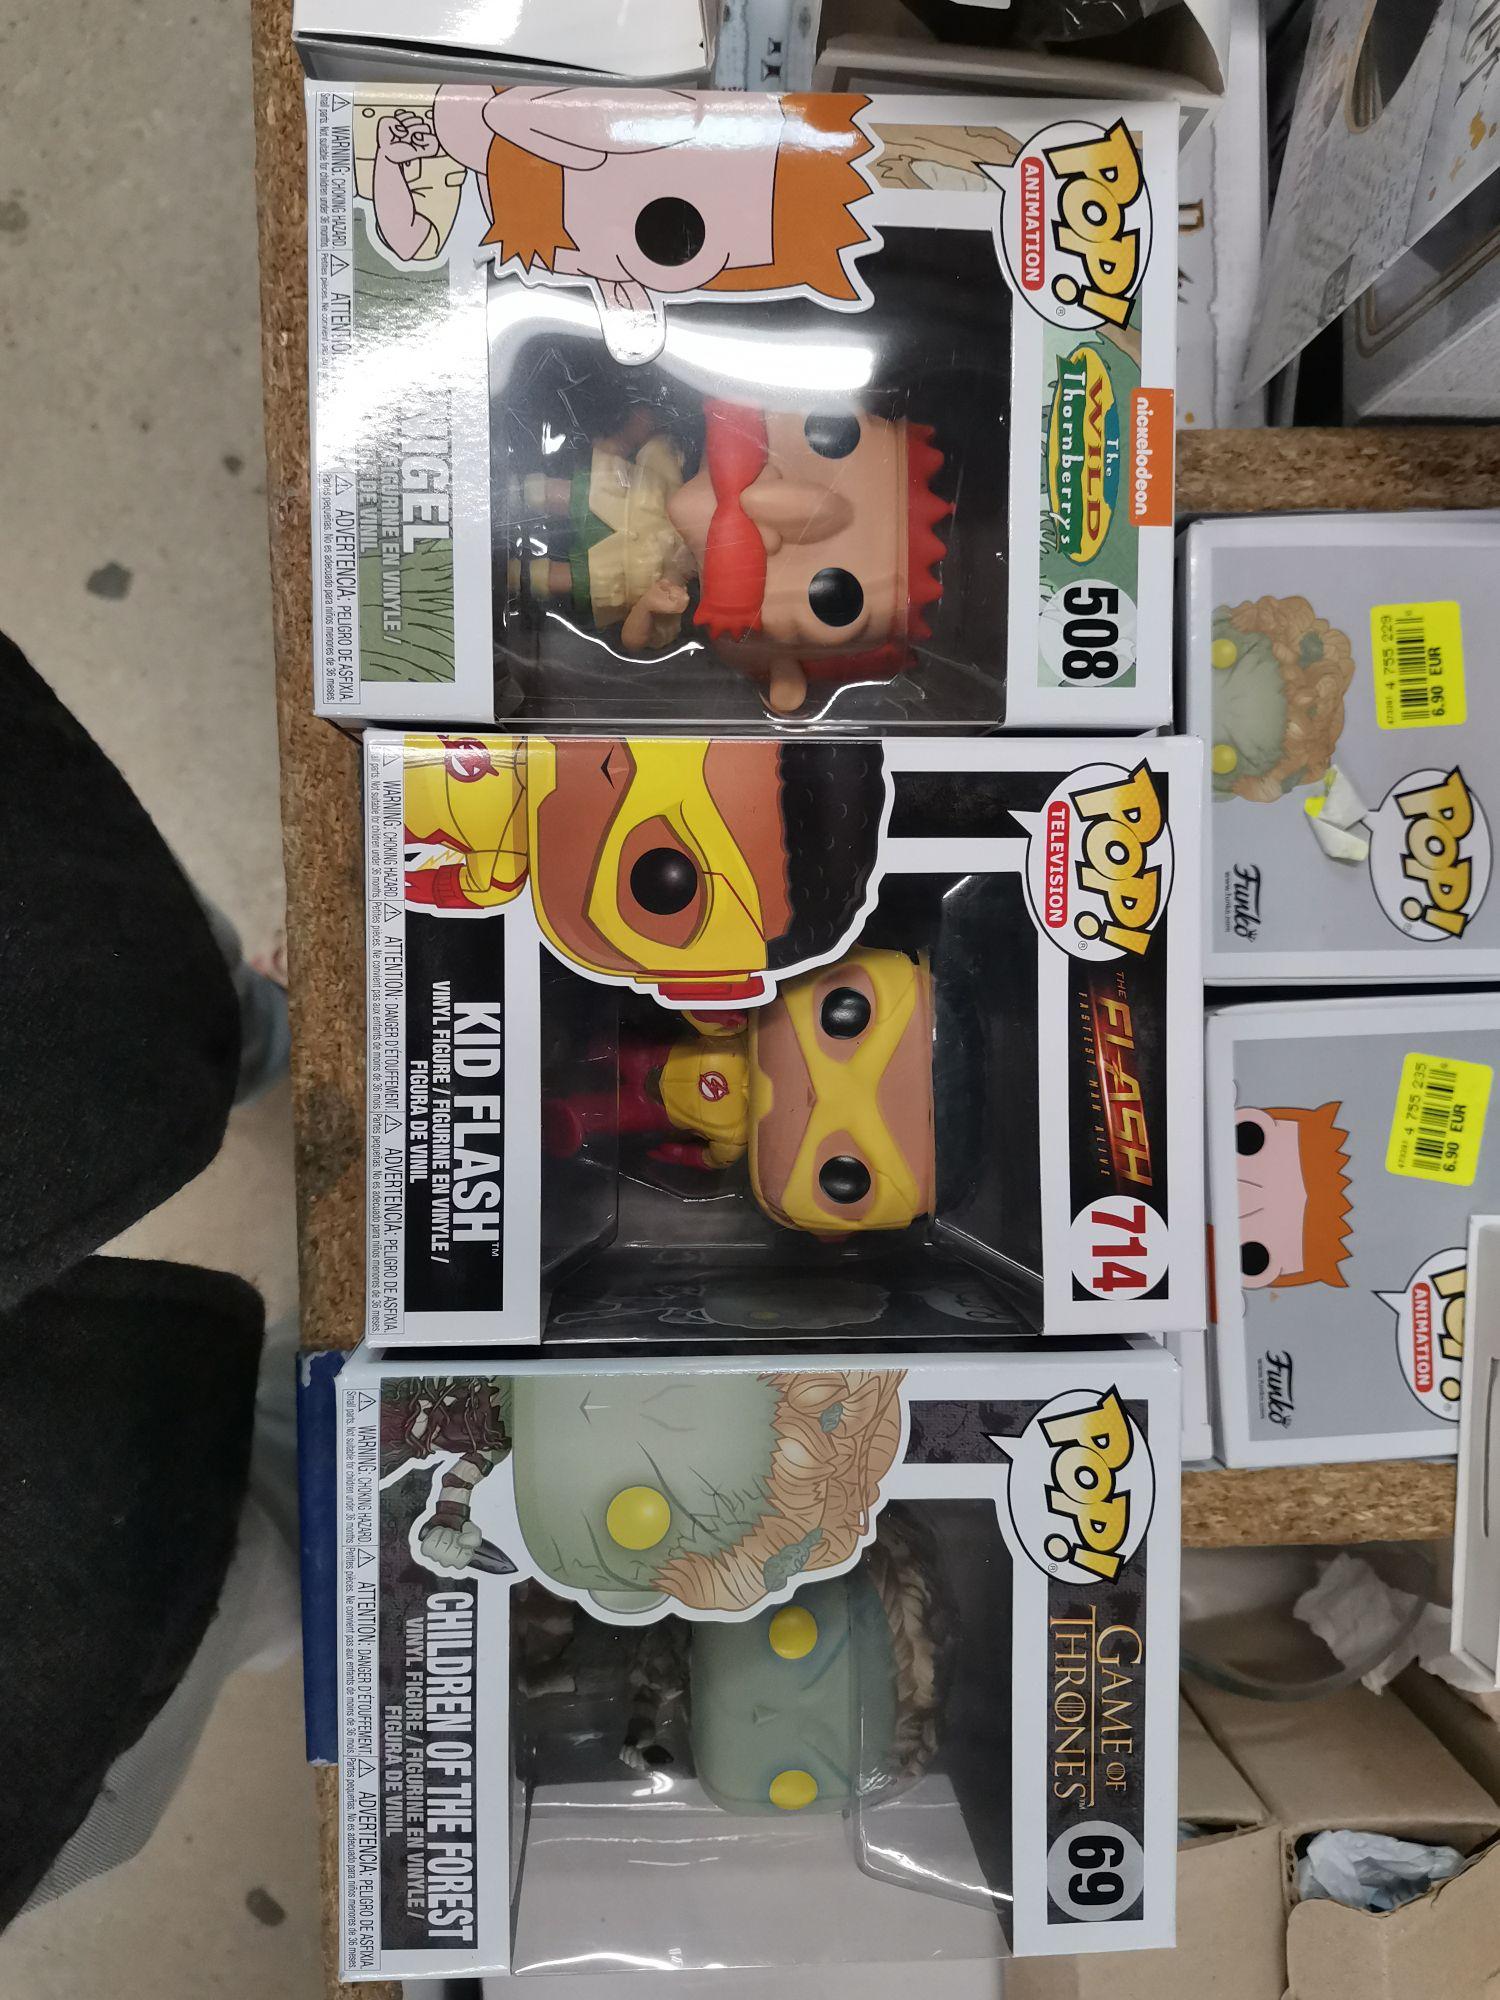 Sélection de figurines Funko Pop! (Children of the Forest, Kid Flash, Nigel, Elsa, Olaf, Anna...) à 6.9€ - Marsannay-la-Côte (21)